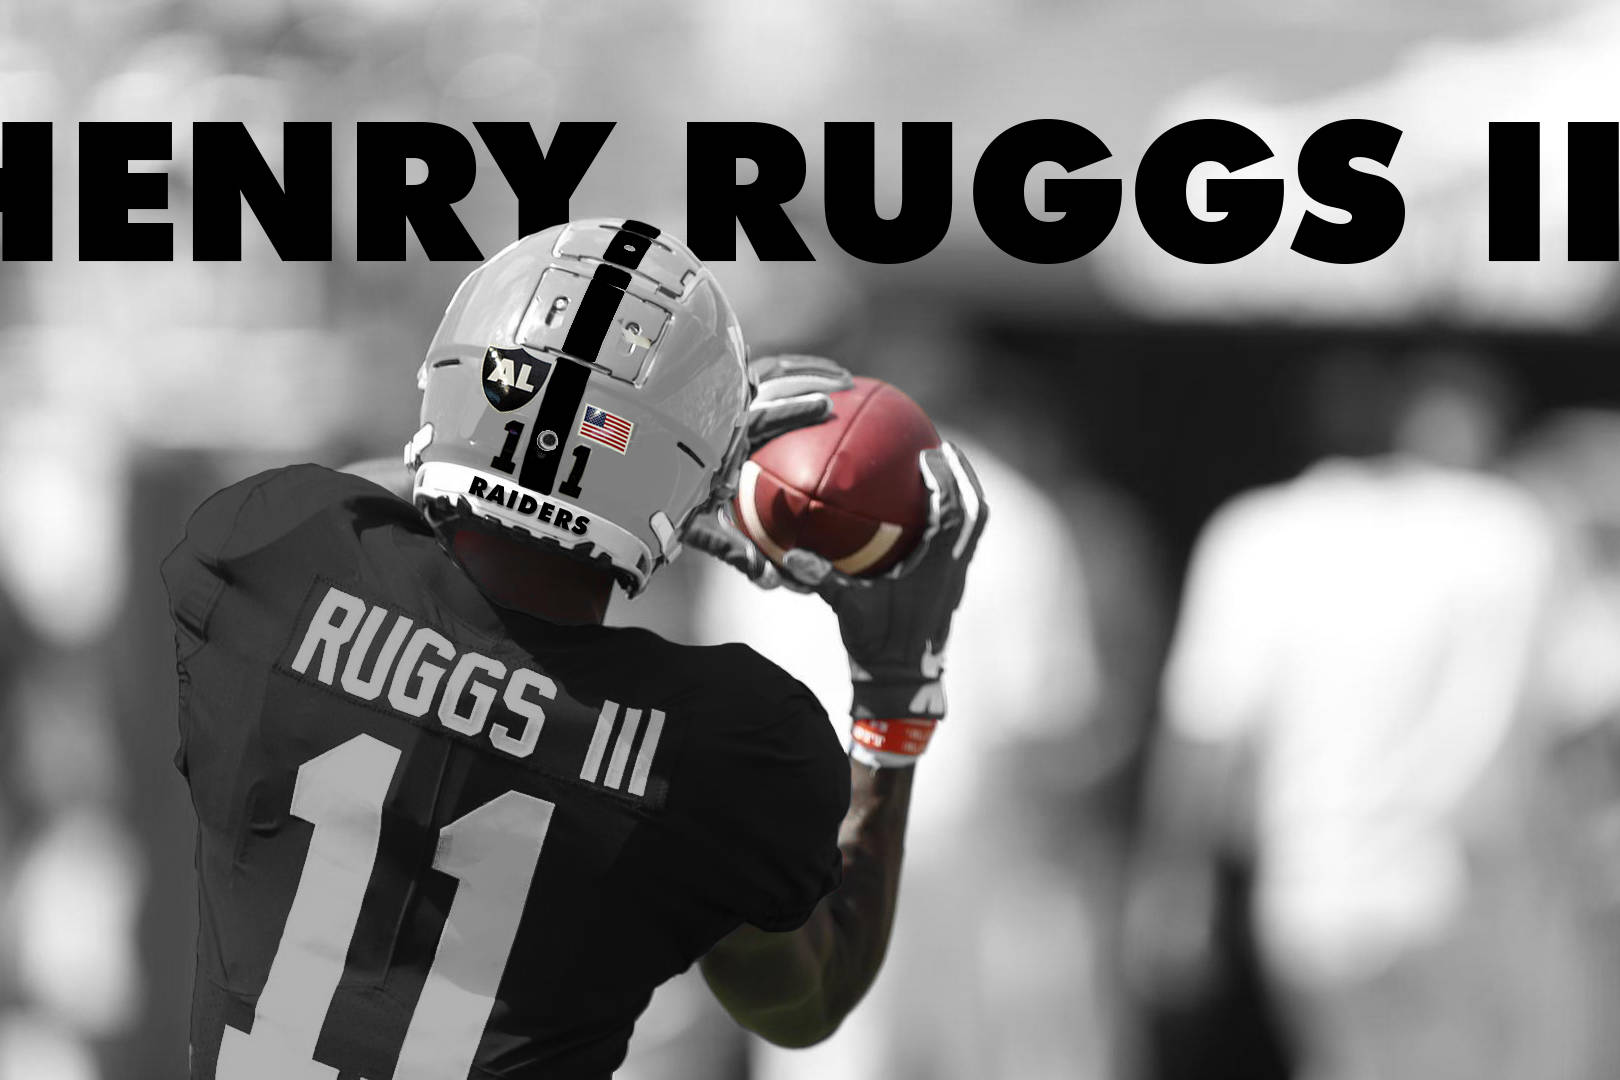 Henry Ruggs III: The Original Las Vegas Raider